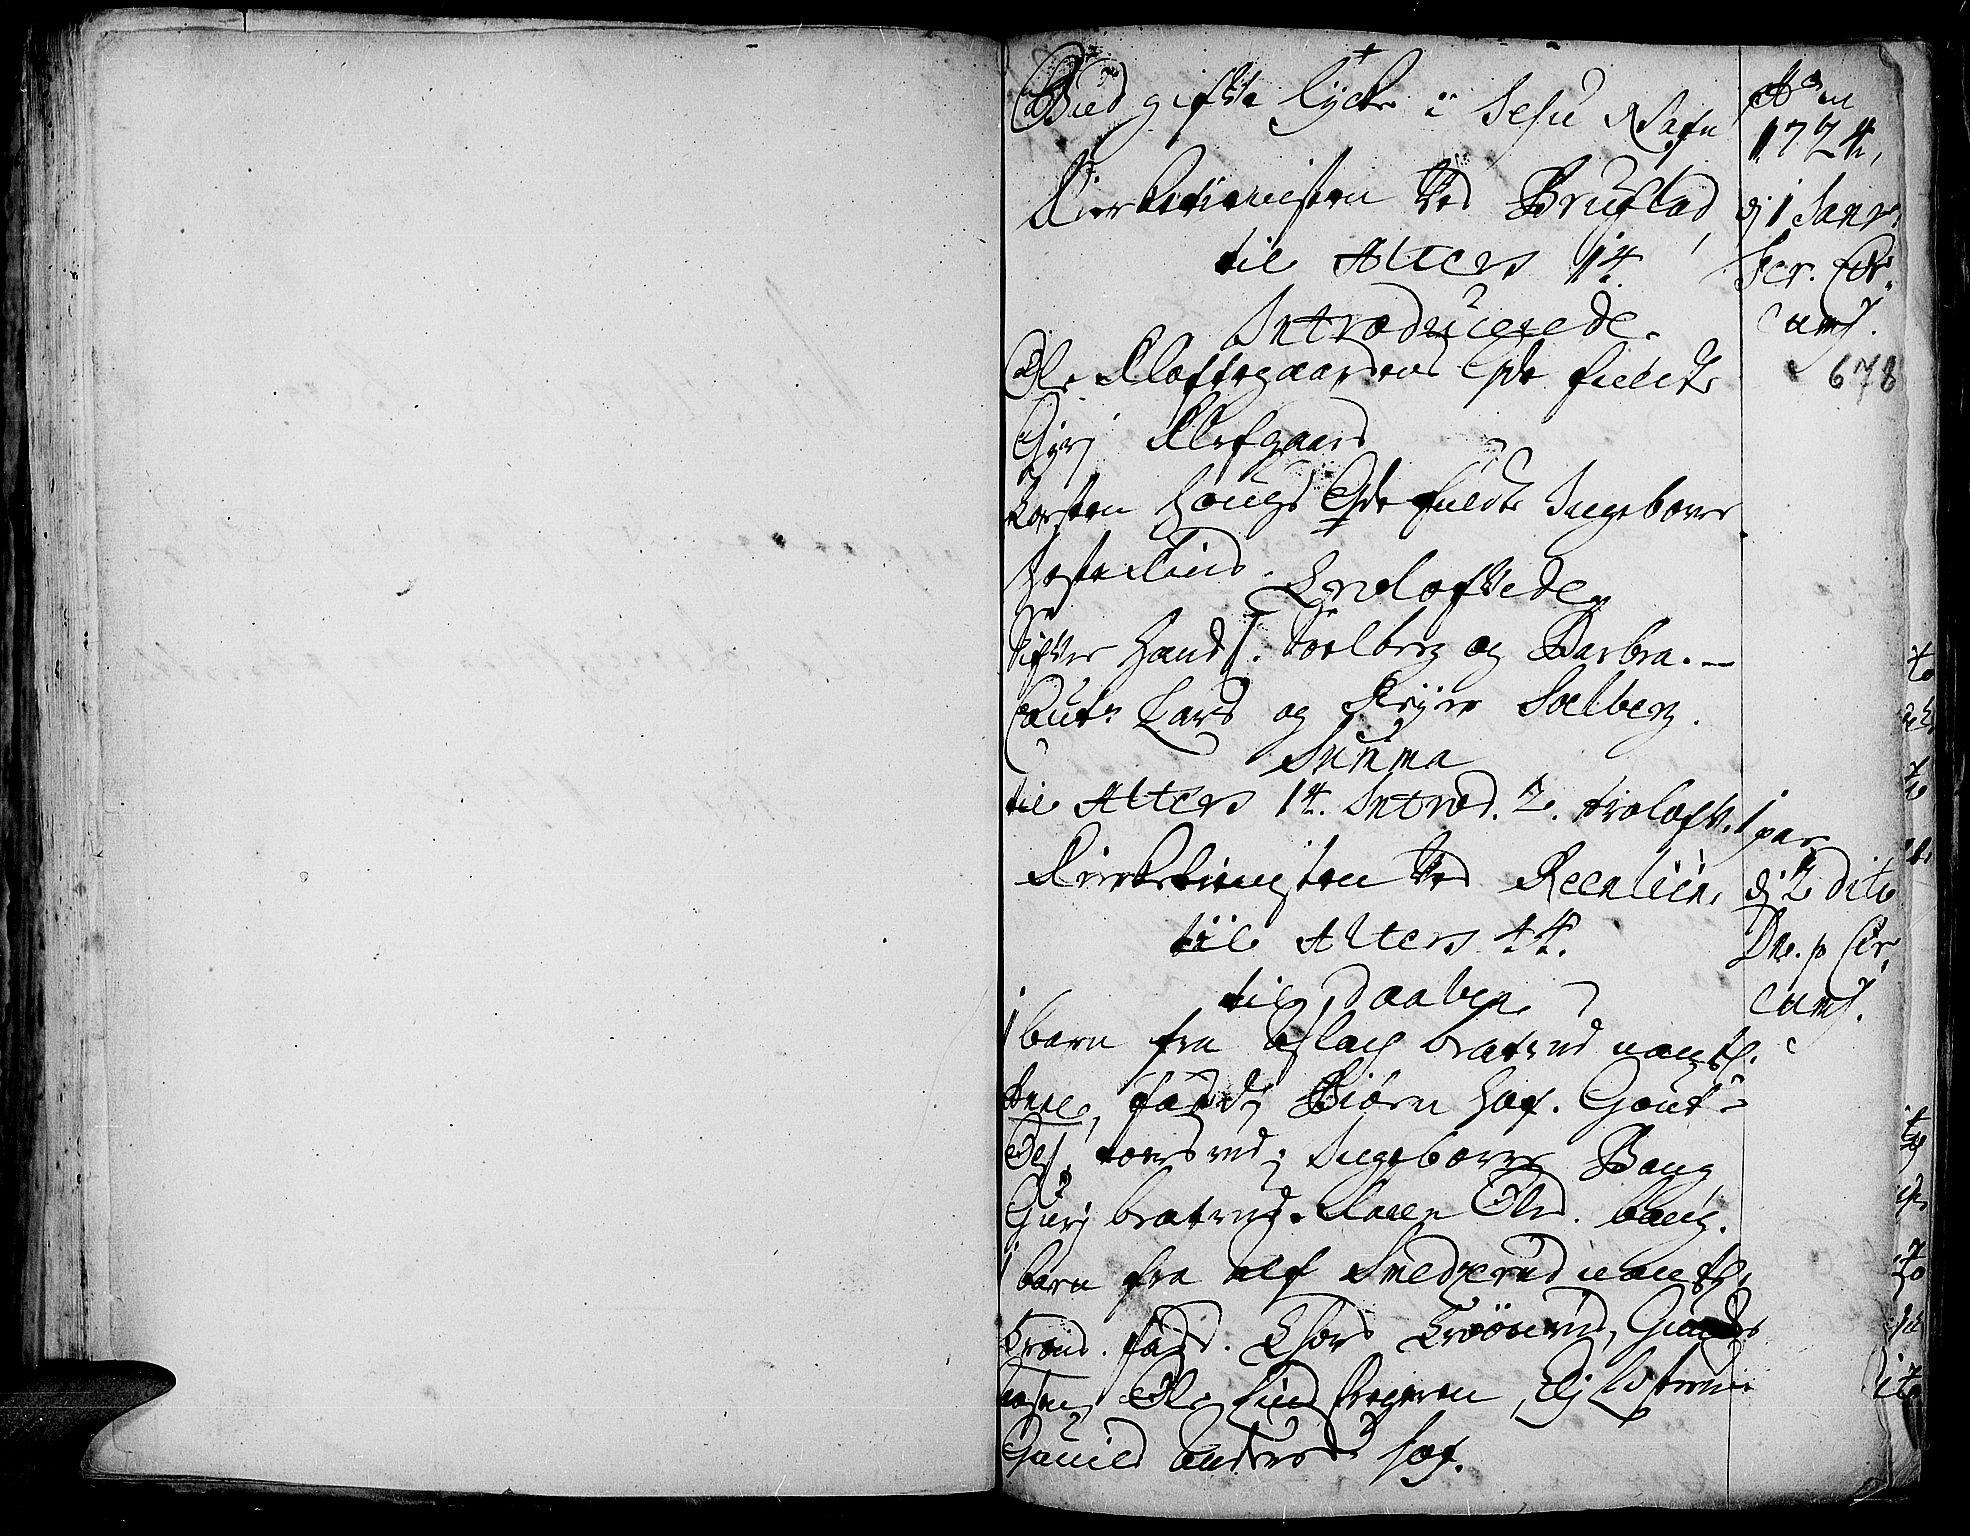 SAH, Aurdal prestekontor, Ministerialbok nr. 1-3, 1692-1730, s. 678